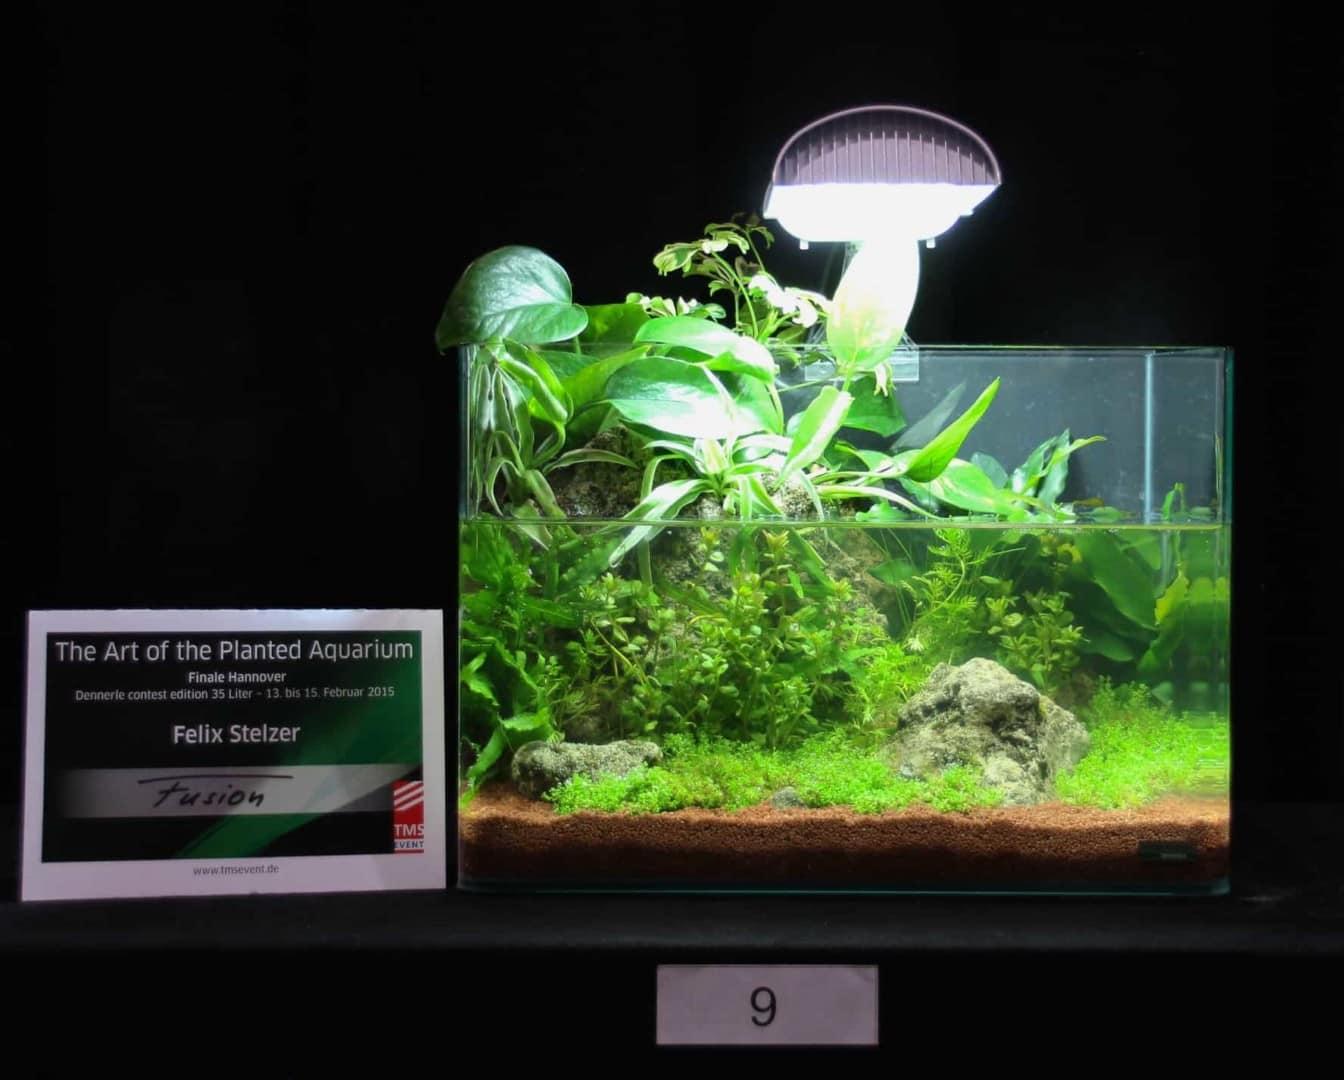 Heimtiermesse Hannover 2015 - THE ART OF THE PLANTED AQUARIUM 27